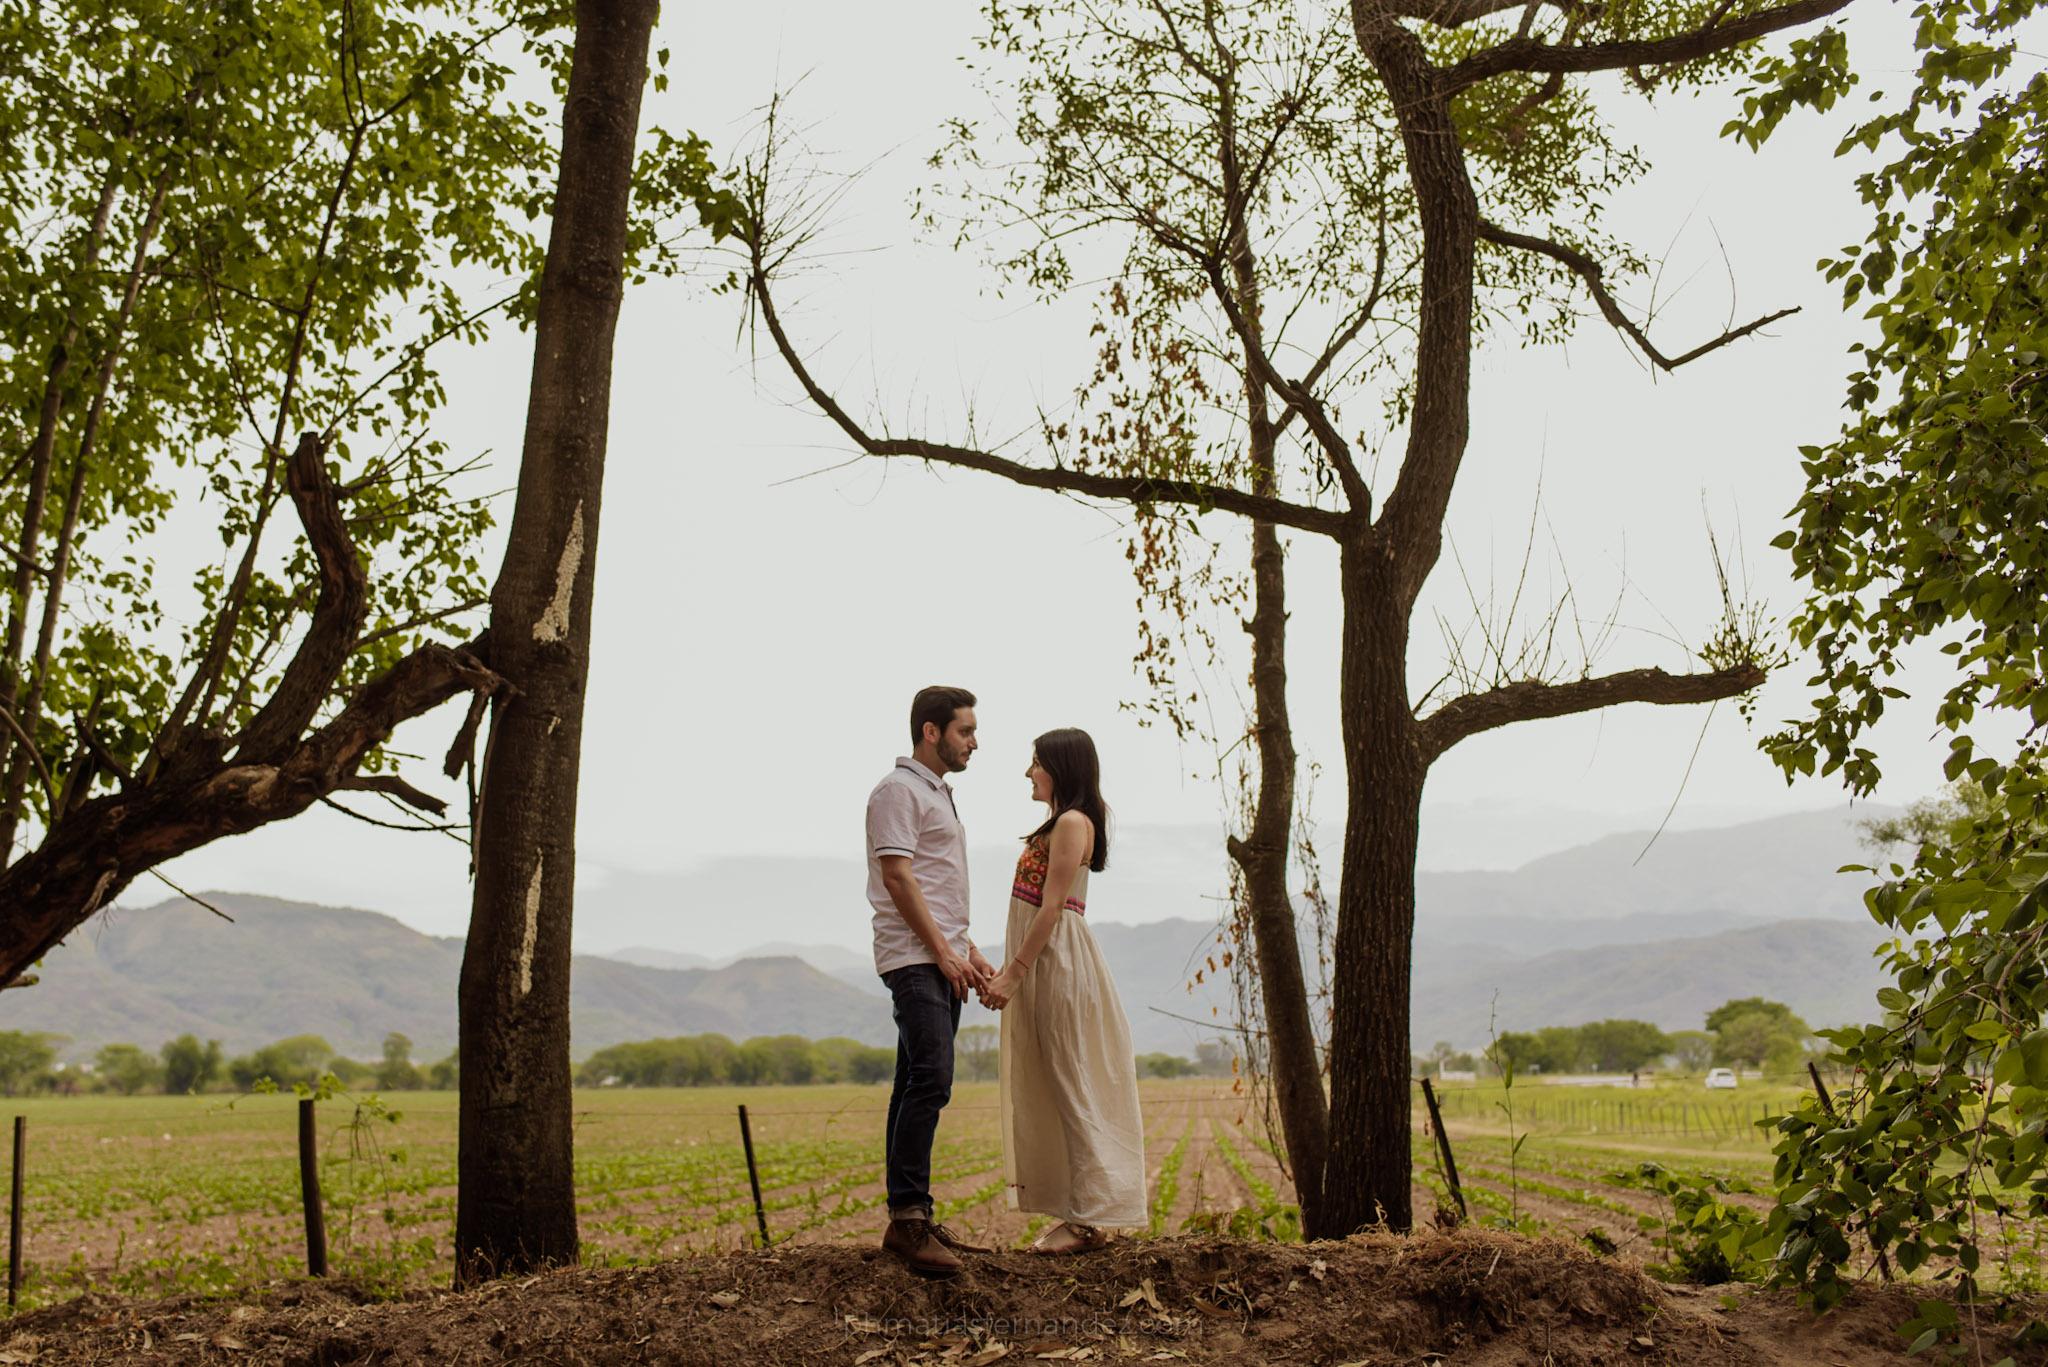 Flor & Alvaro - phmatiasfernandez - matias fernandez